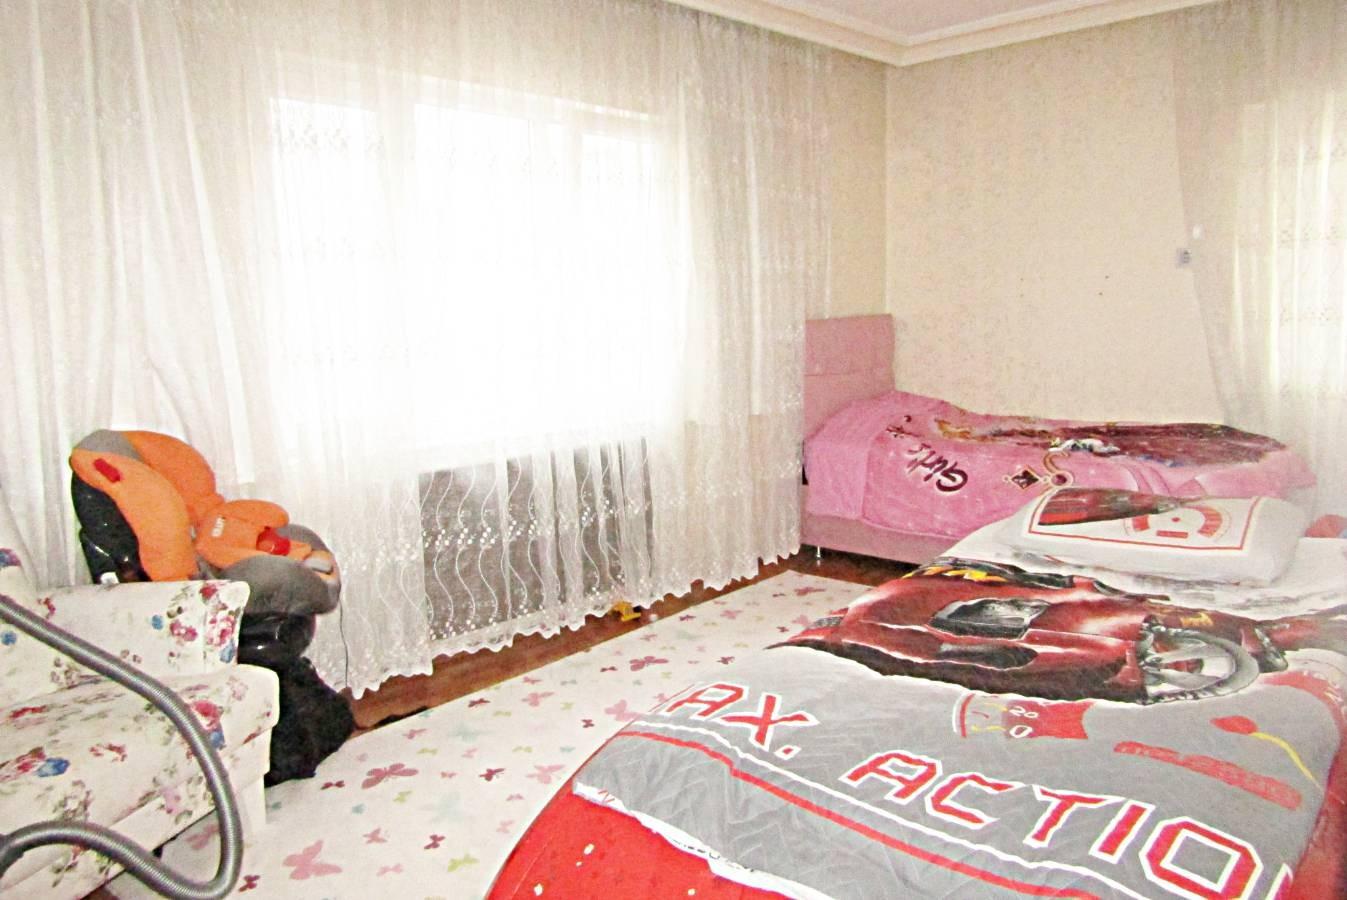 SR EMLAK'TAN PİYADE MAH'DE 3+1 130 m²  BAĞIMSIZ YAPILI ARA KATTA CADDEYE YAKIN DAİRE